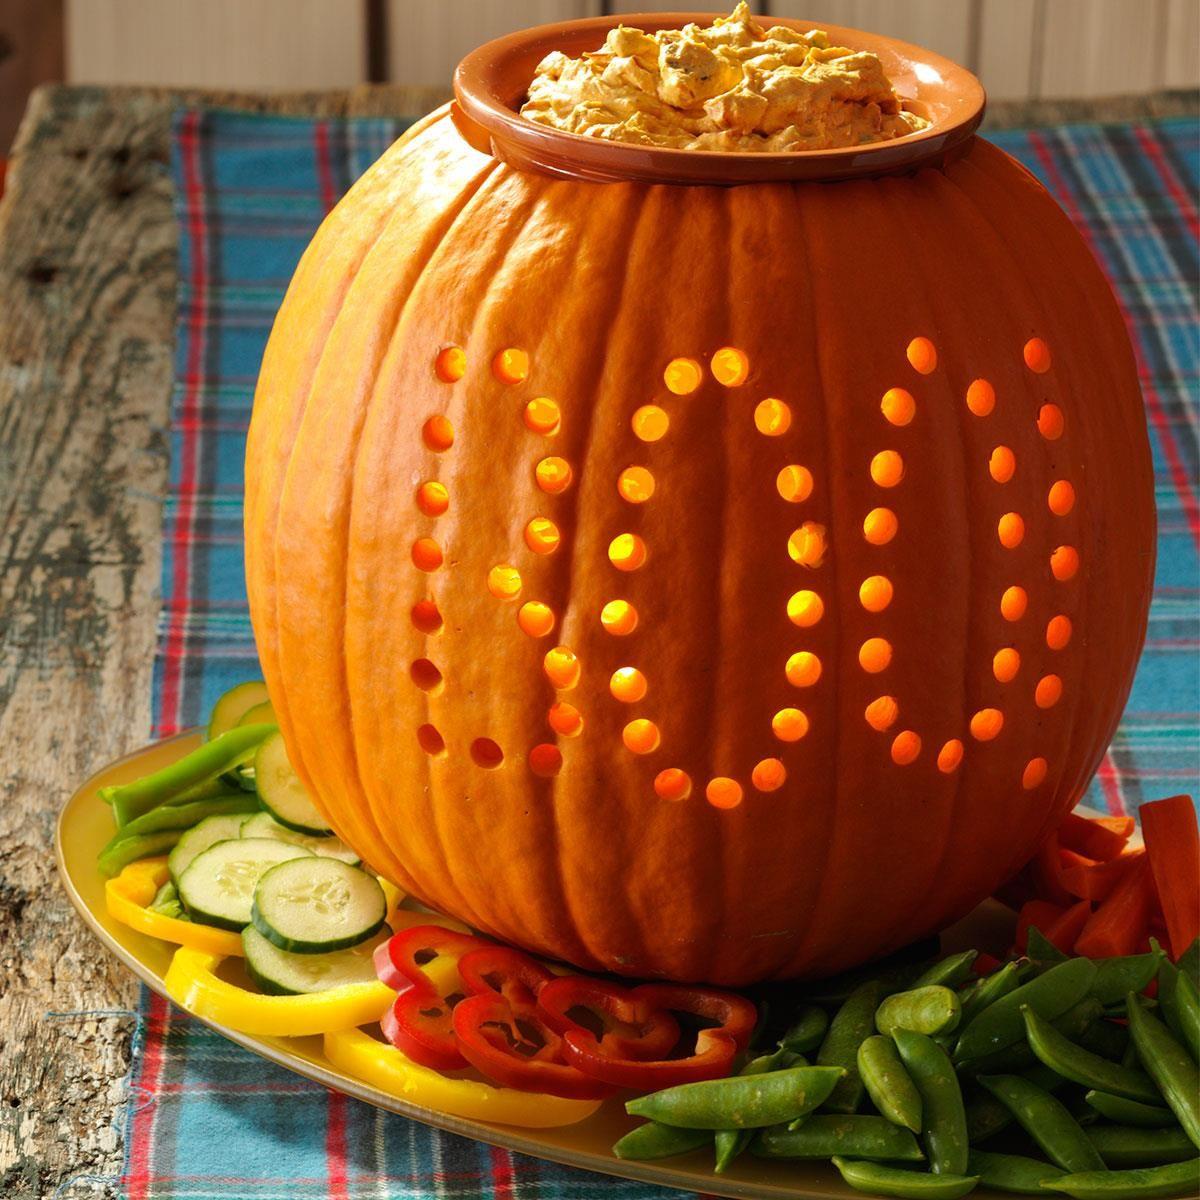 Festive Pumpkin Dip Recipe (With images) Pumpkin dip